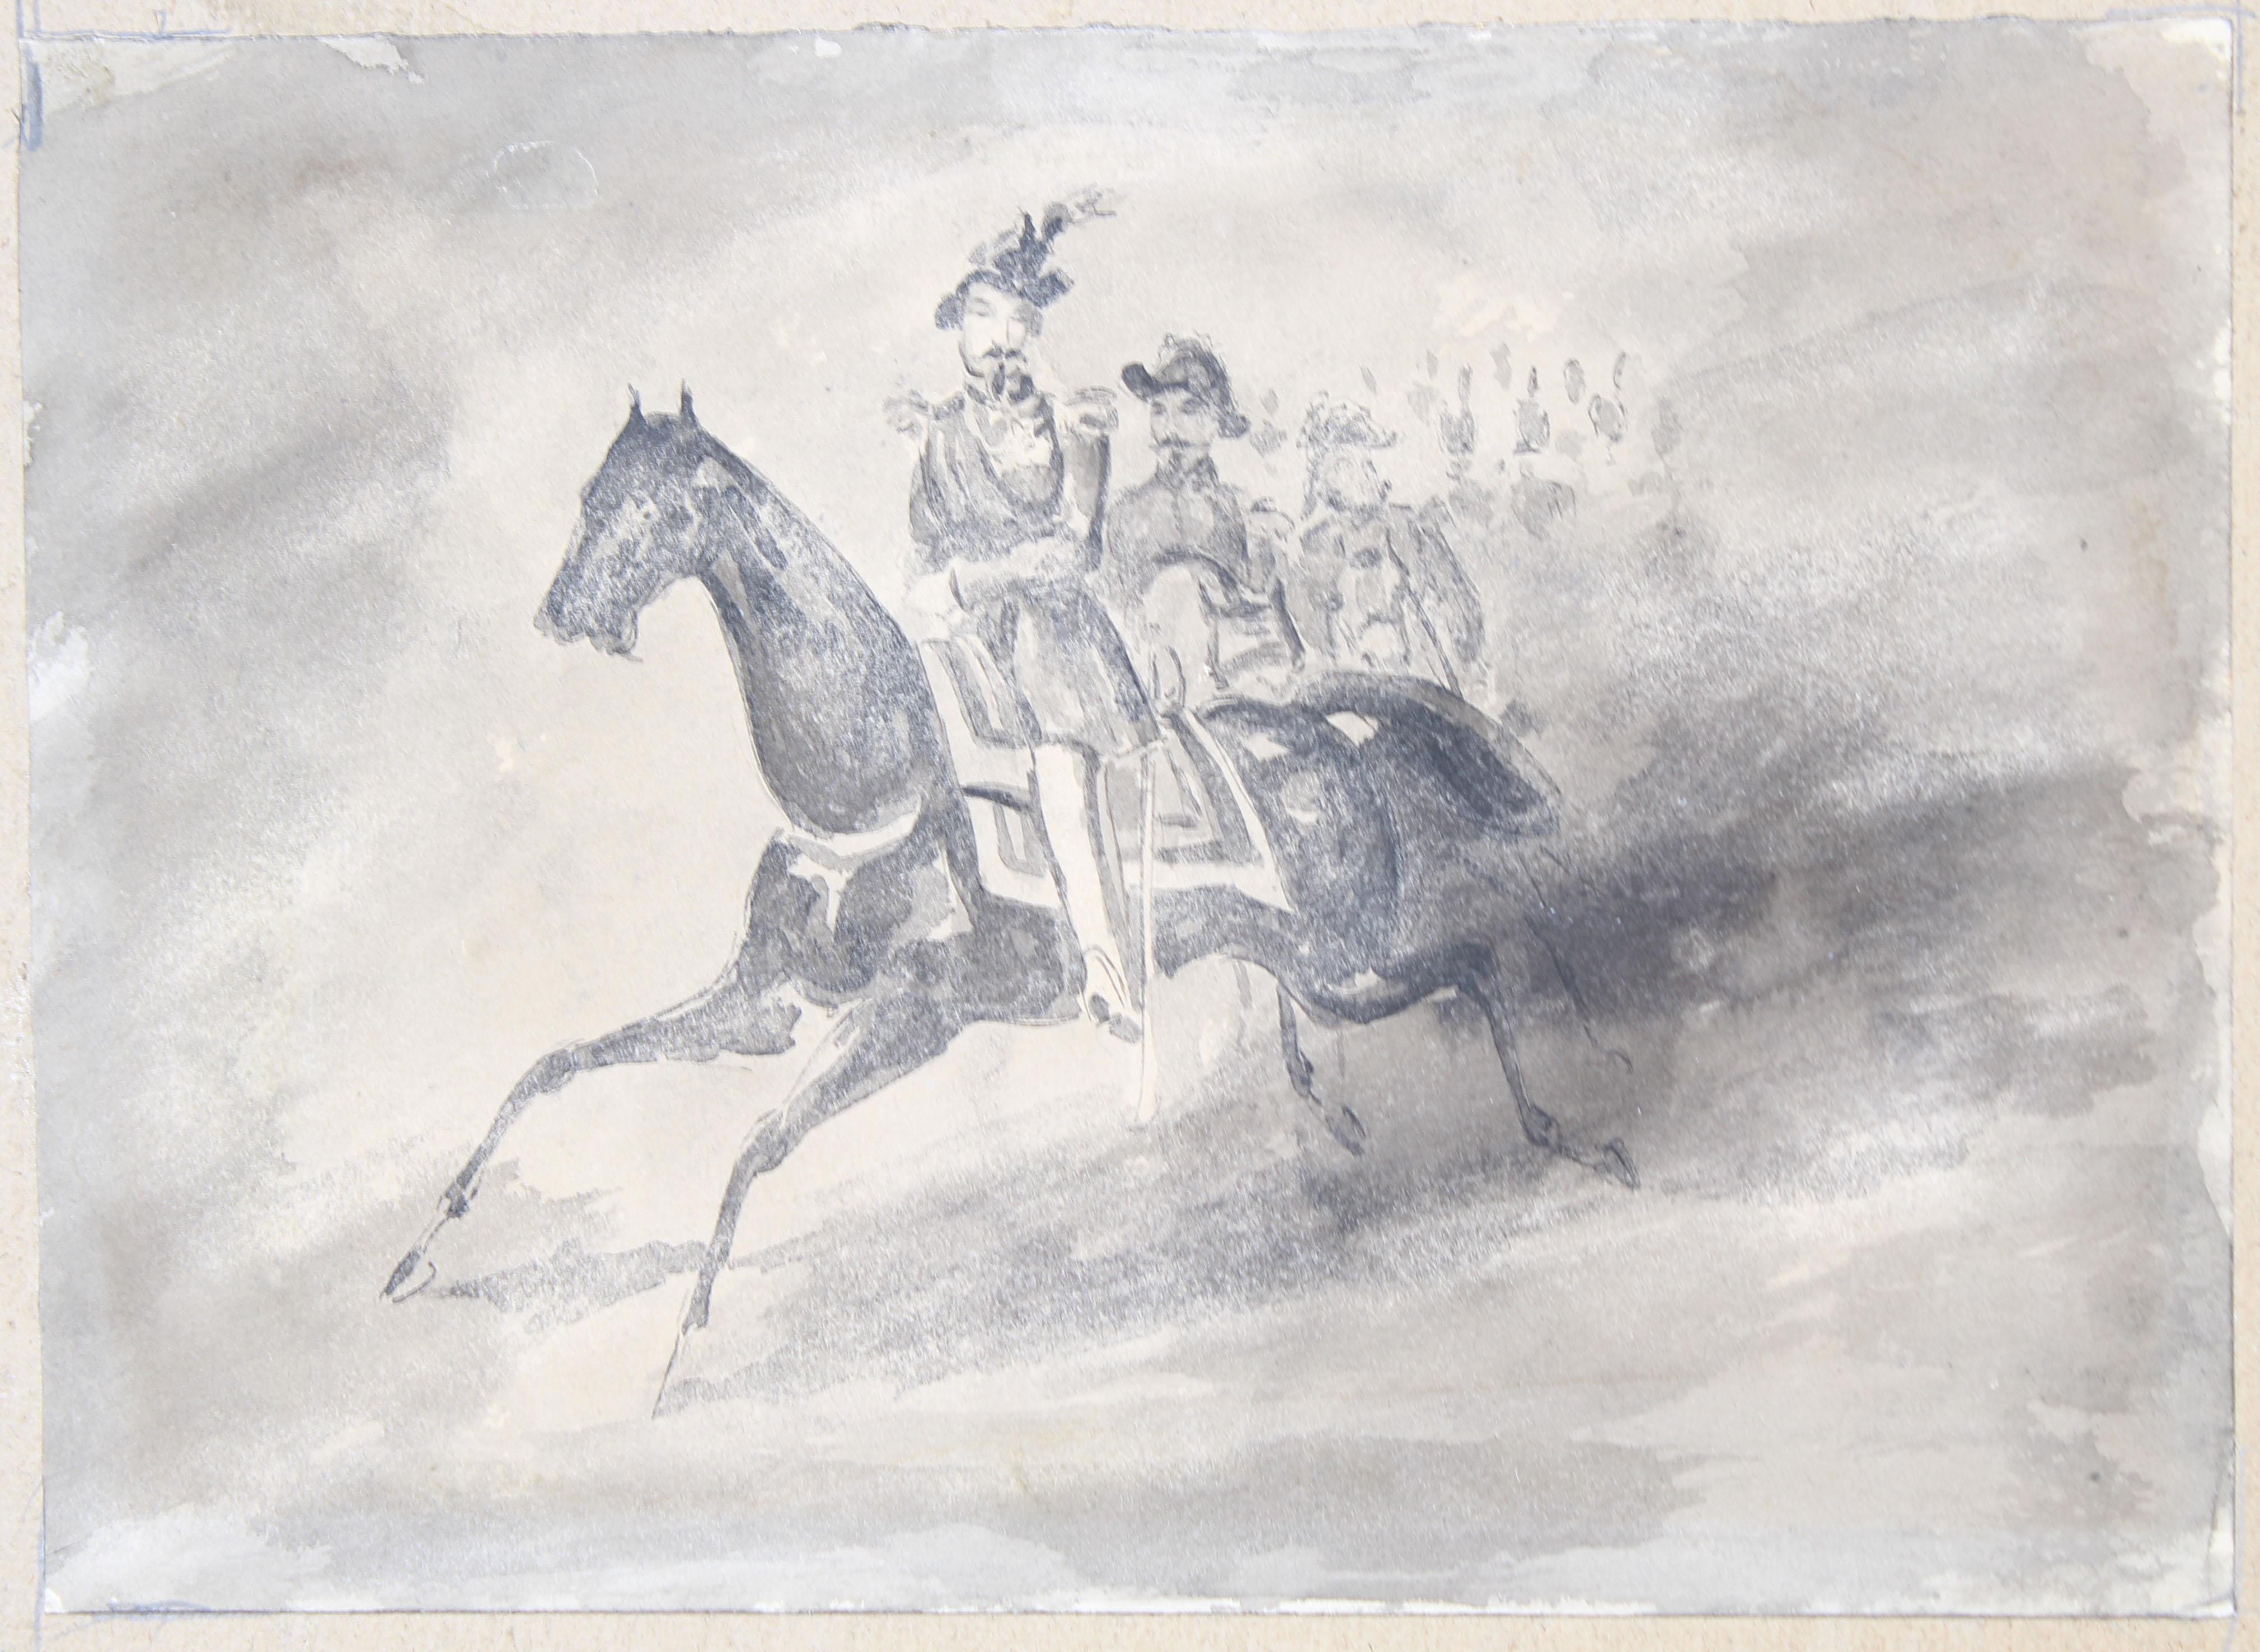 Lot 94 - Constantin Guys (1802 - 1892)